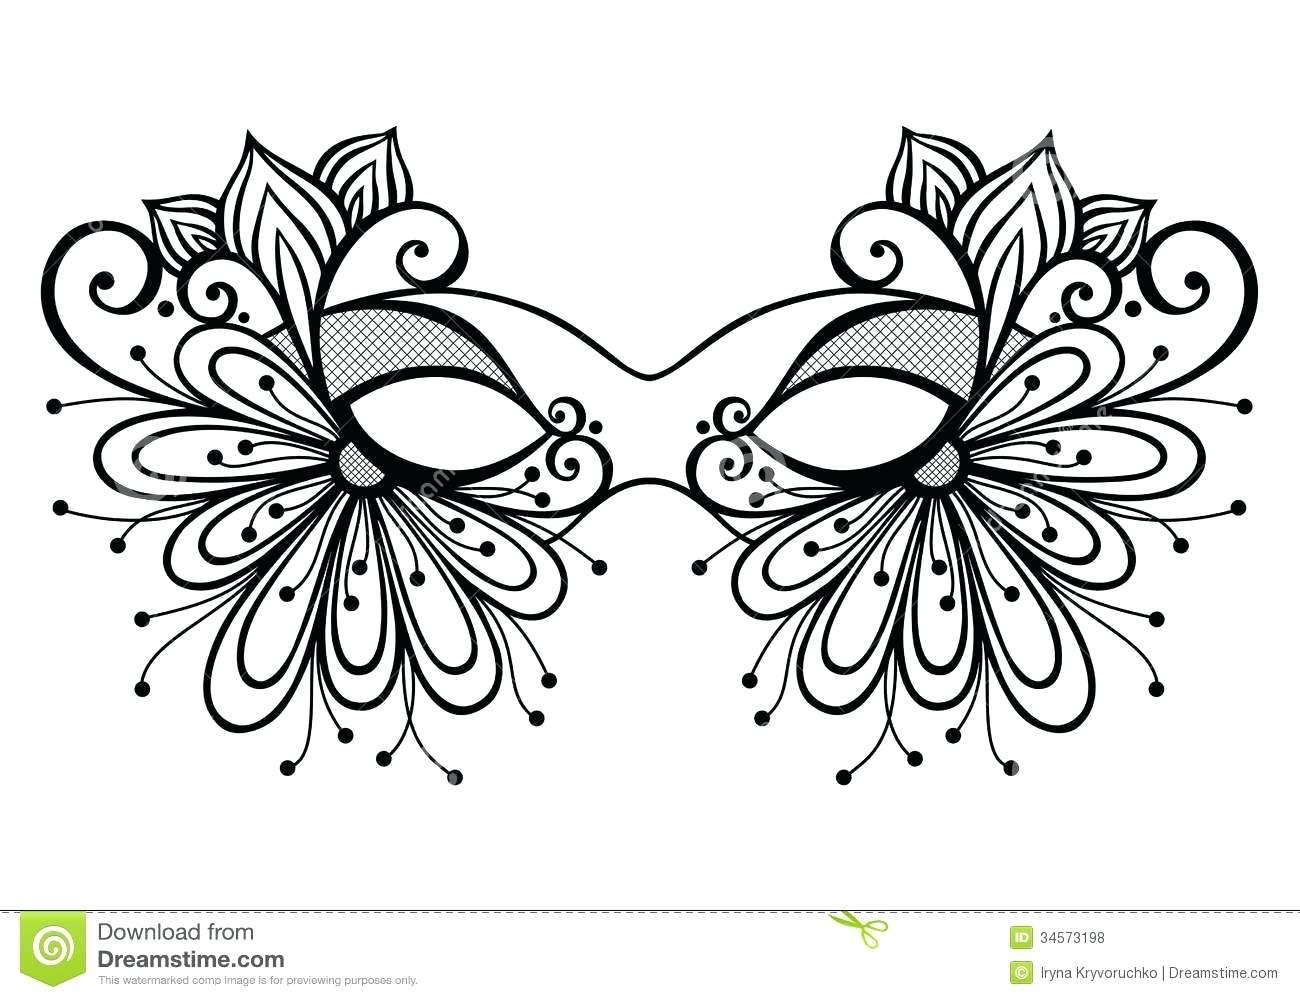 Masquerade Masks Drawing at GetDrawings.com | Free for personal use ...